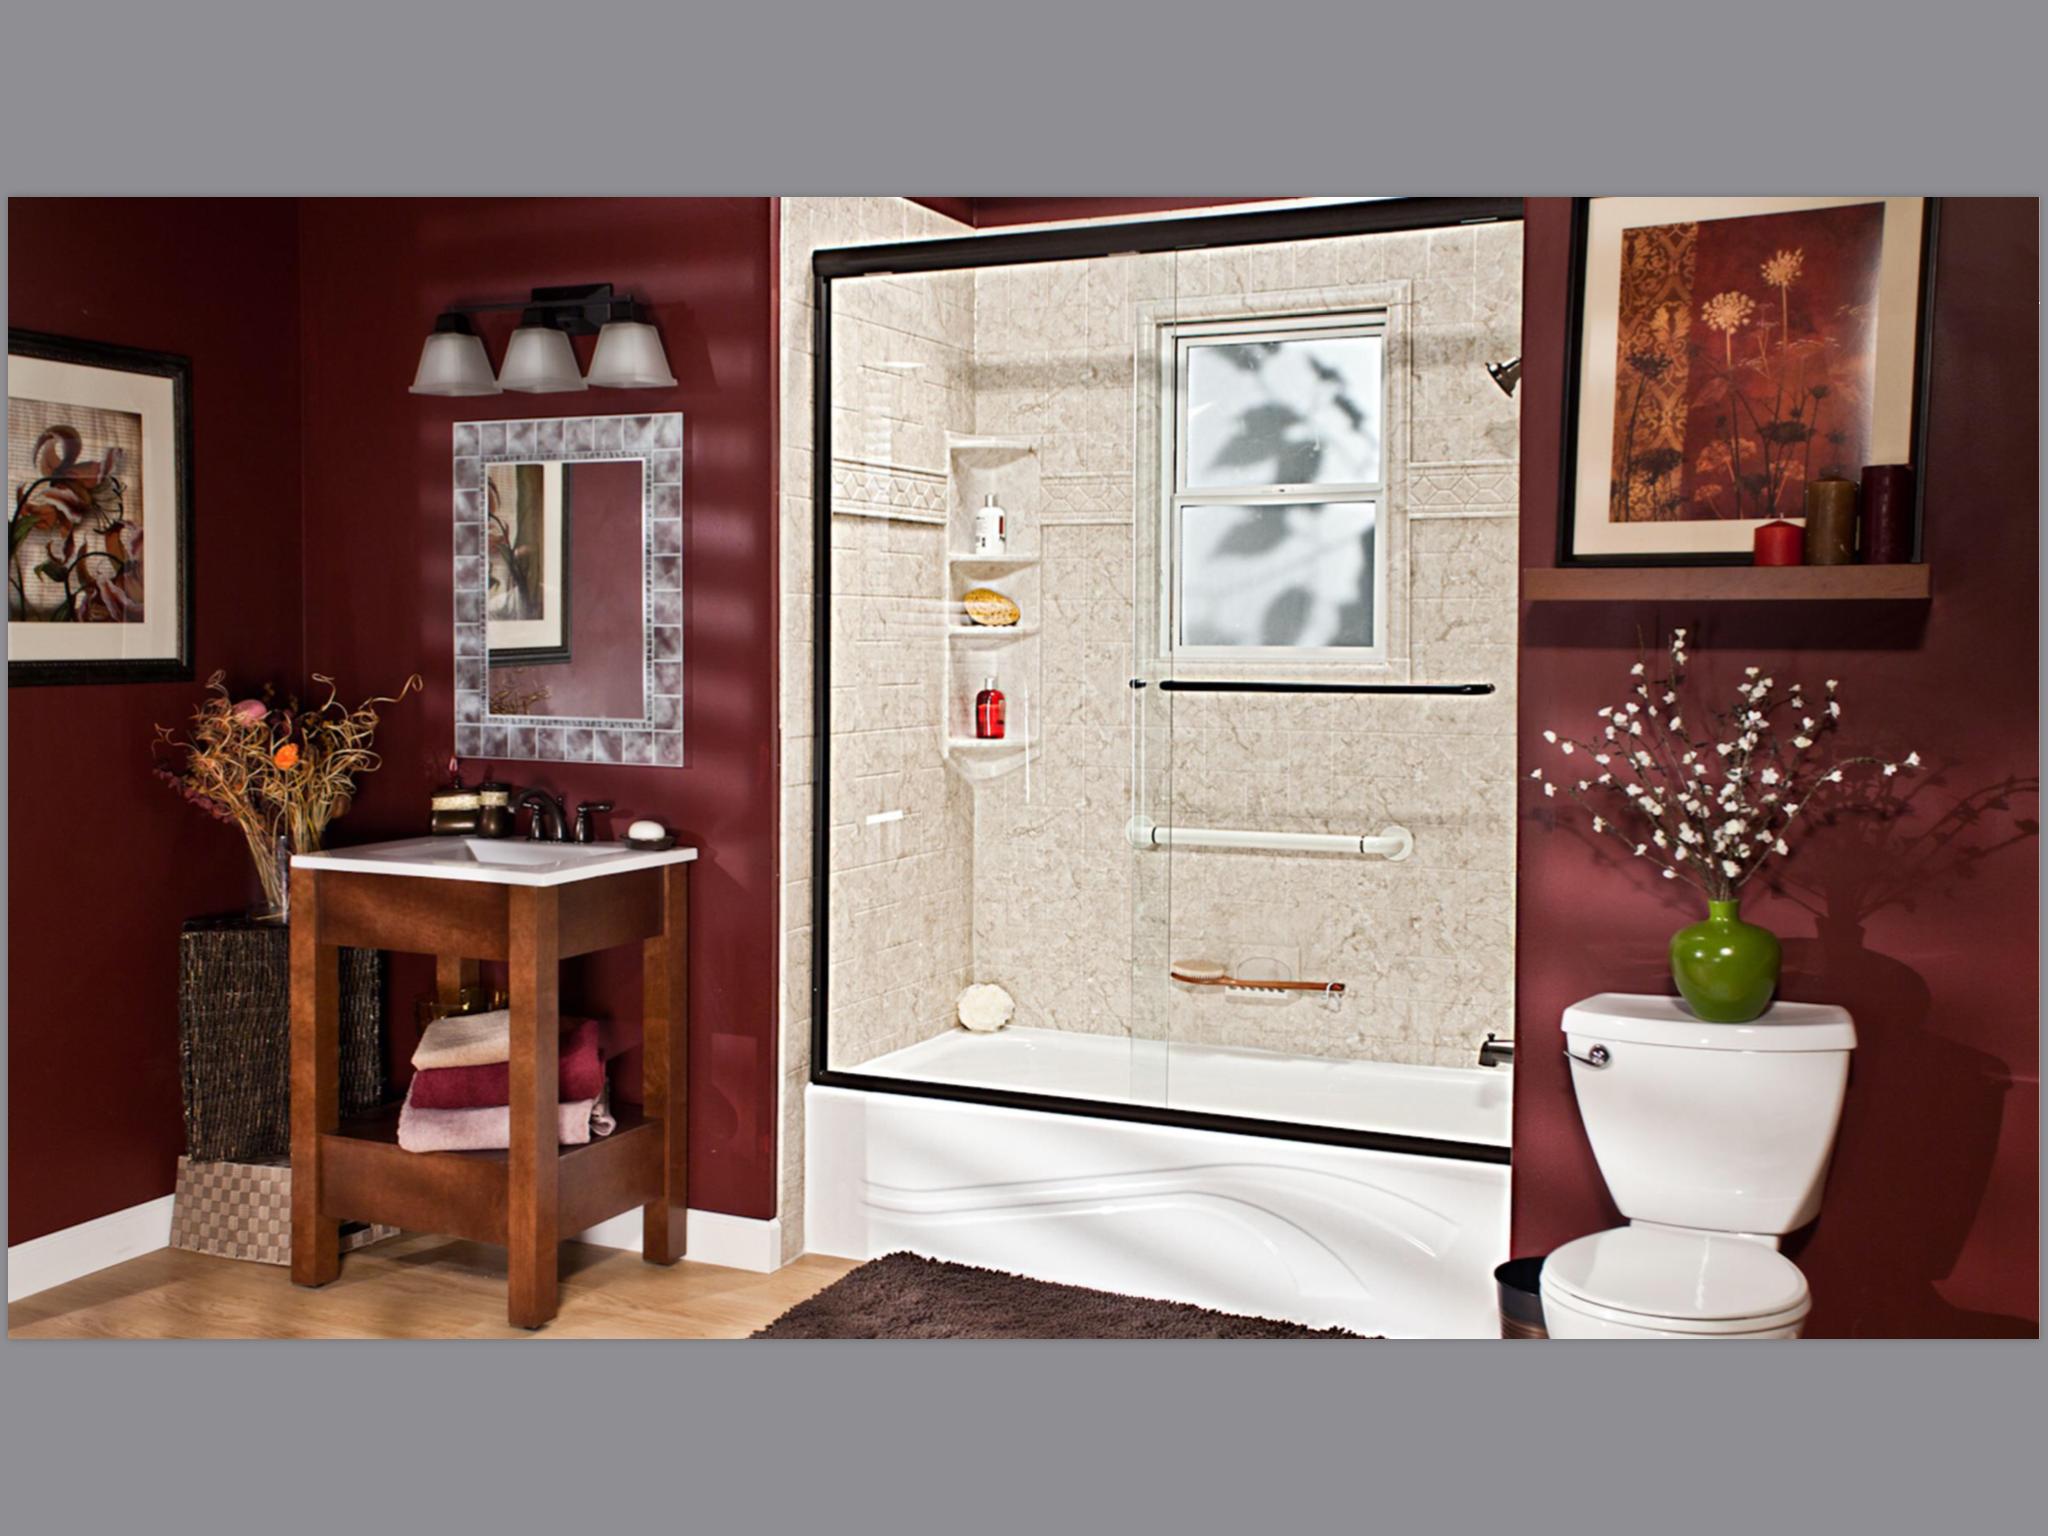 DuraStone Bath Products Premium  Tub / Shower Replacement